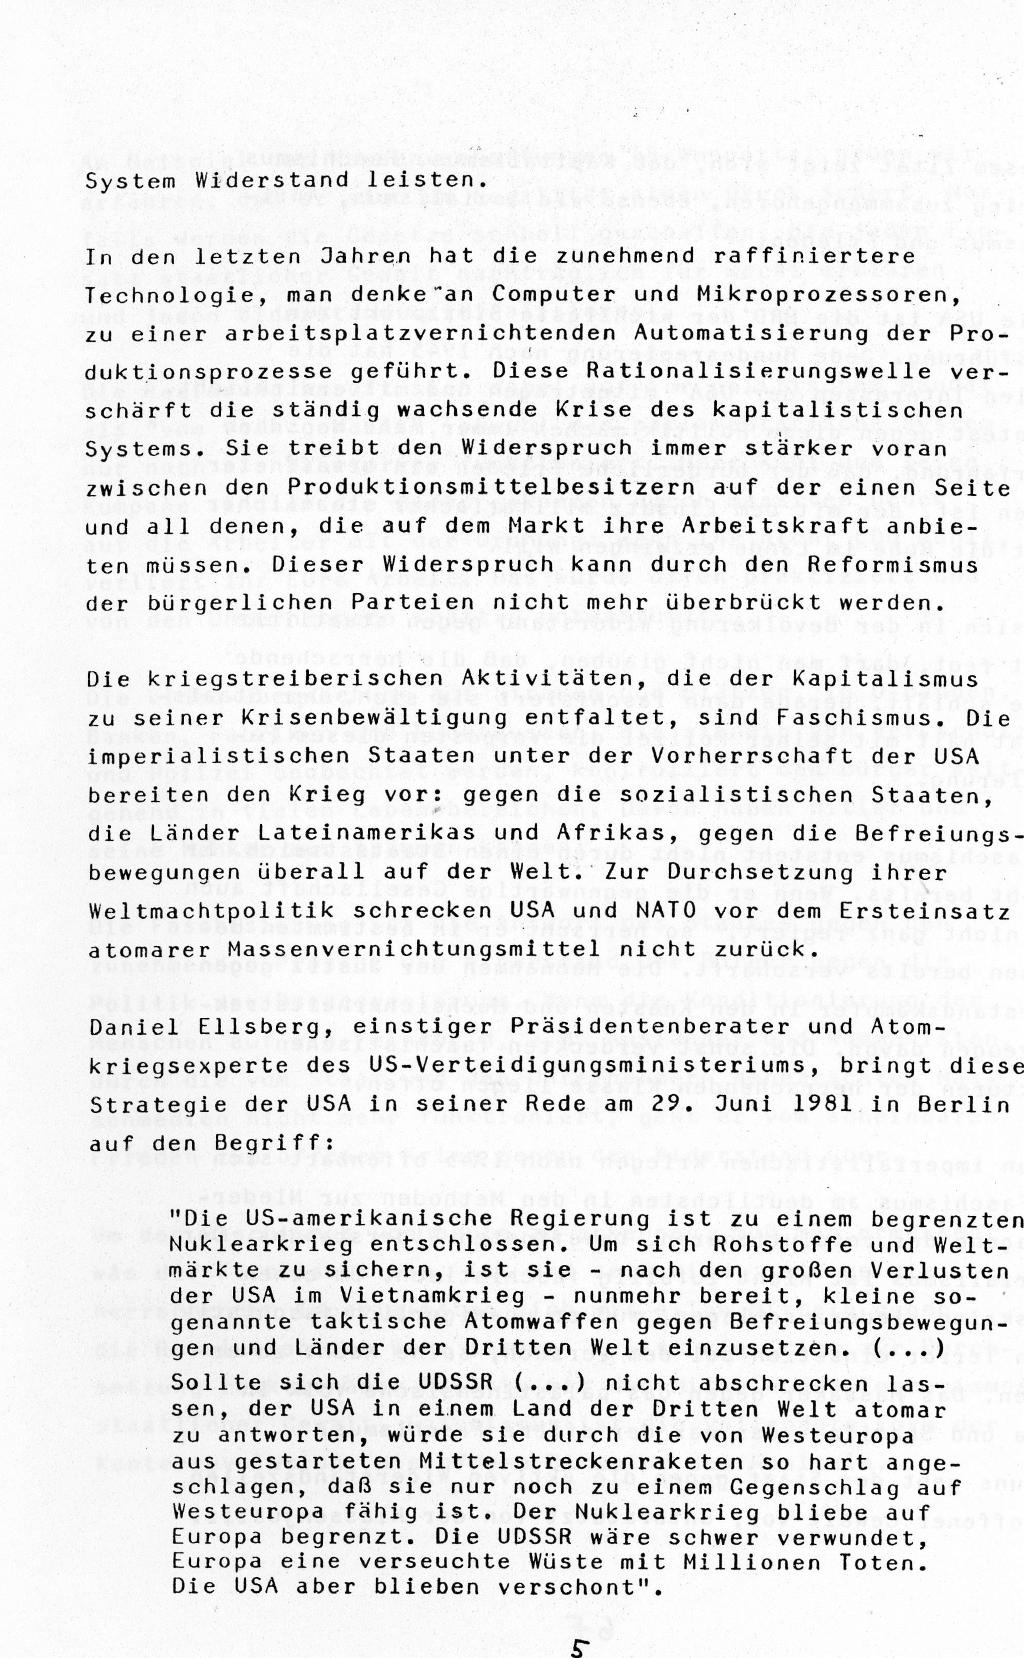 Berlin_1983_Autonome_Gruppen_Faschismus_im_Kapitalismus_05